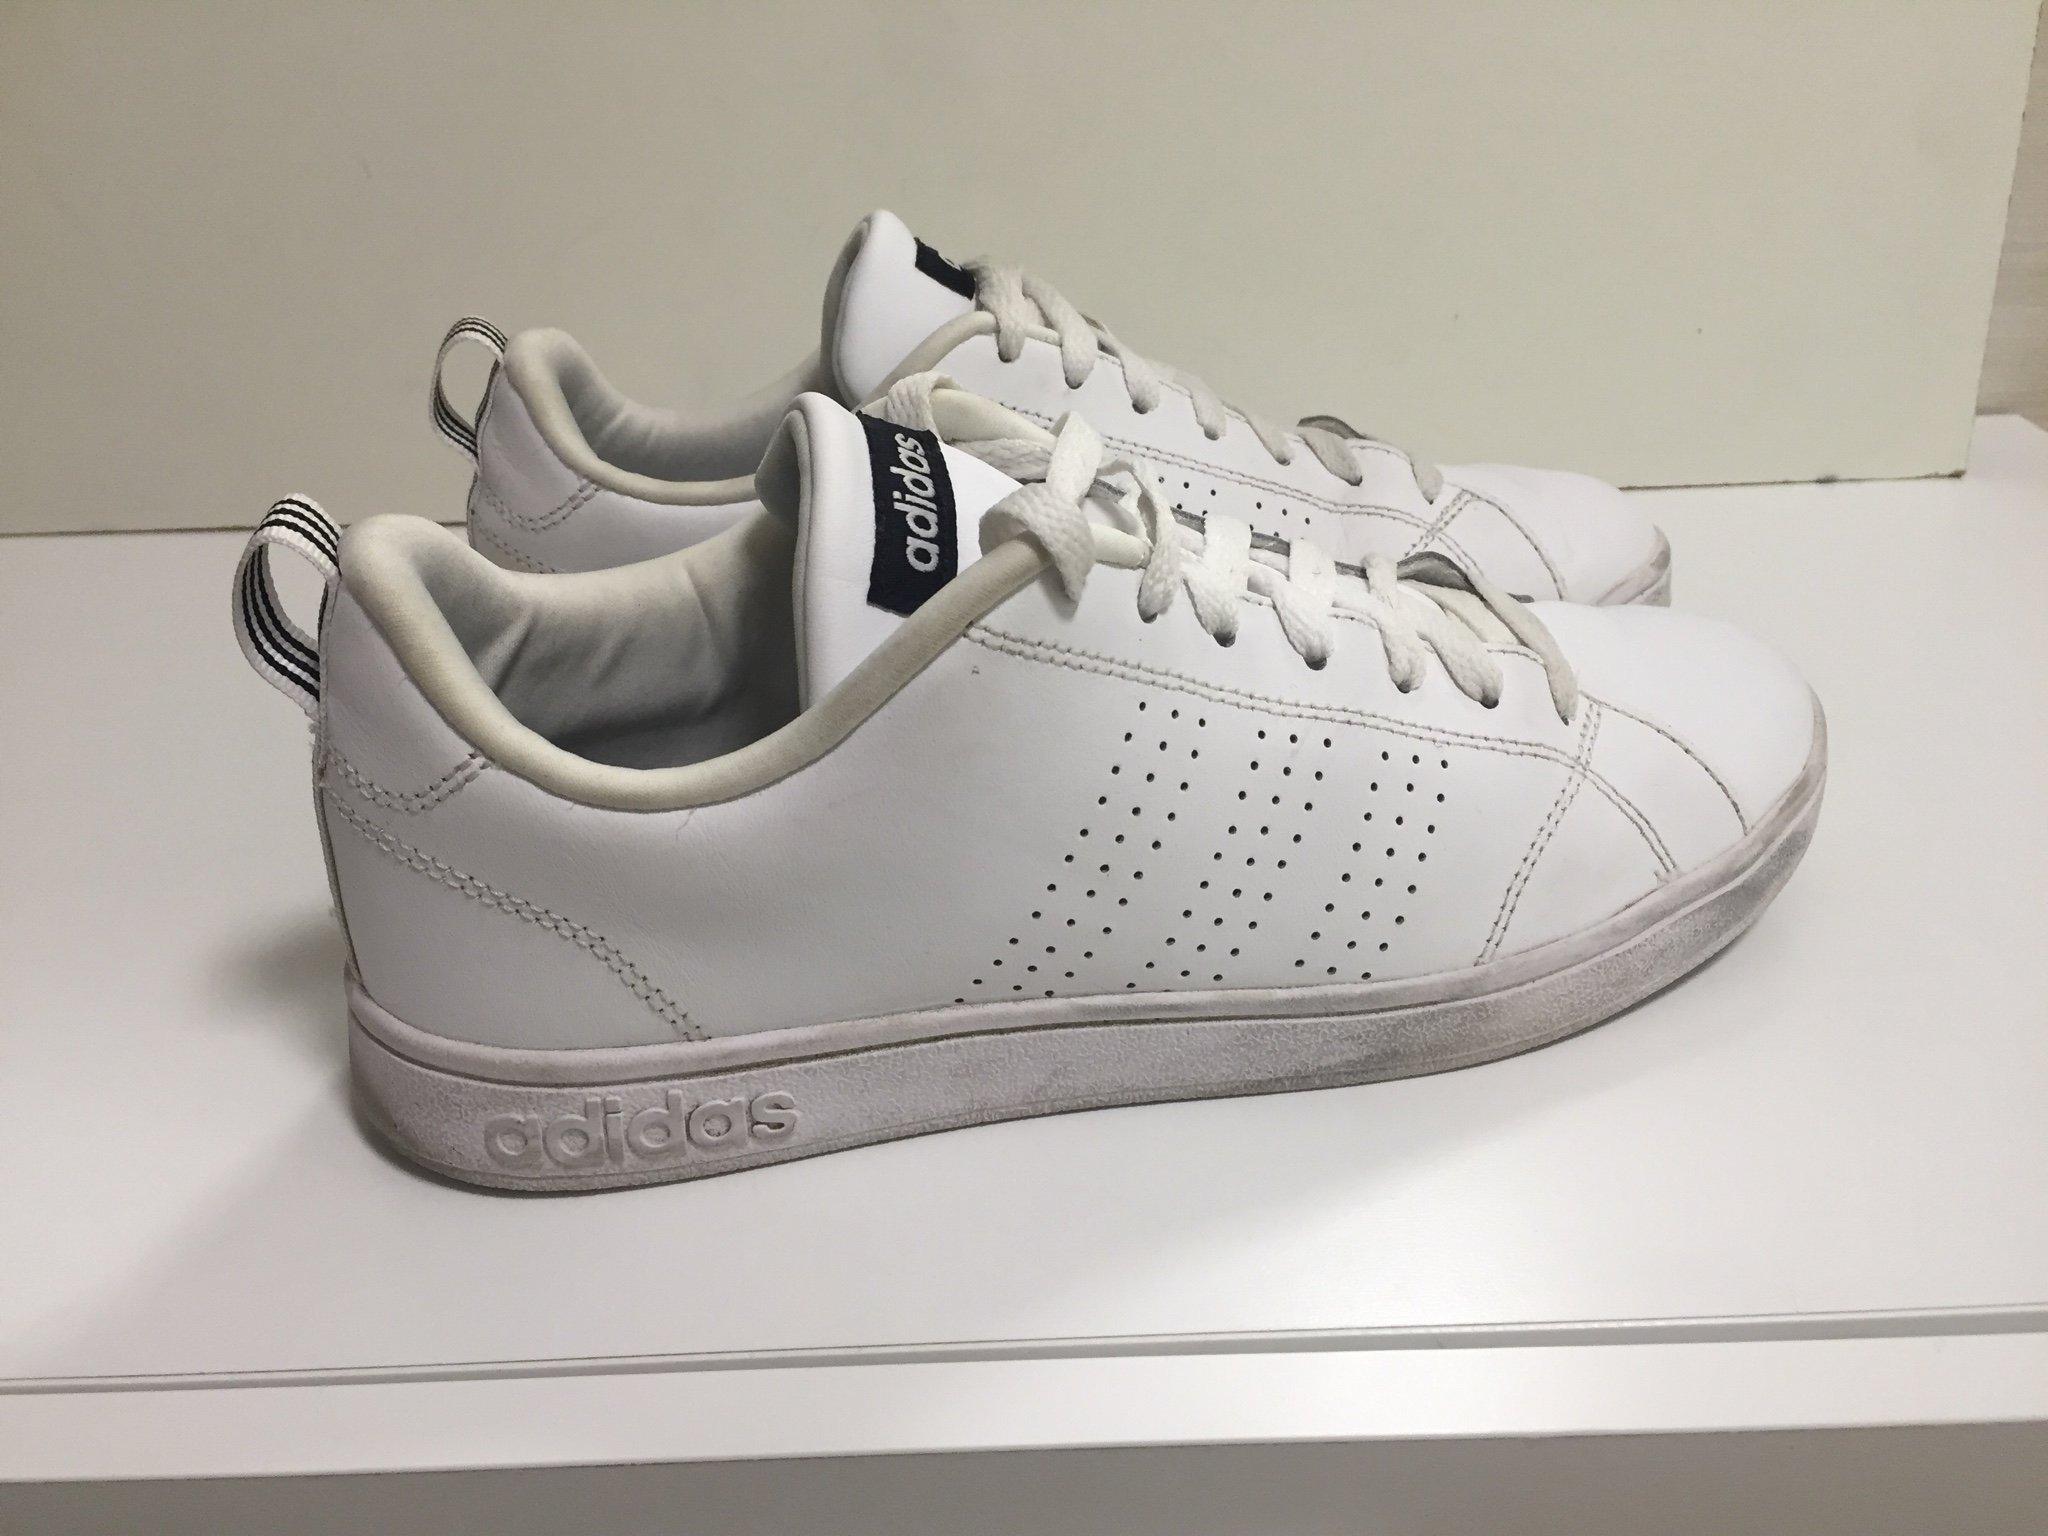 Sneakers Adidas, Stl 41,5 Stil Uppsala